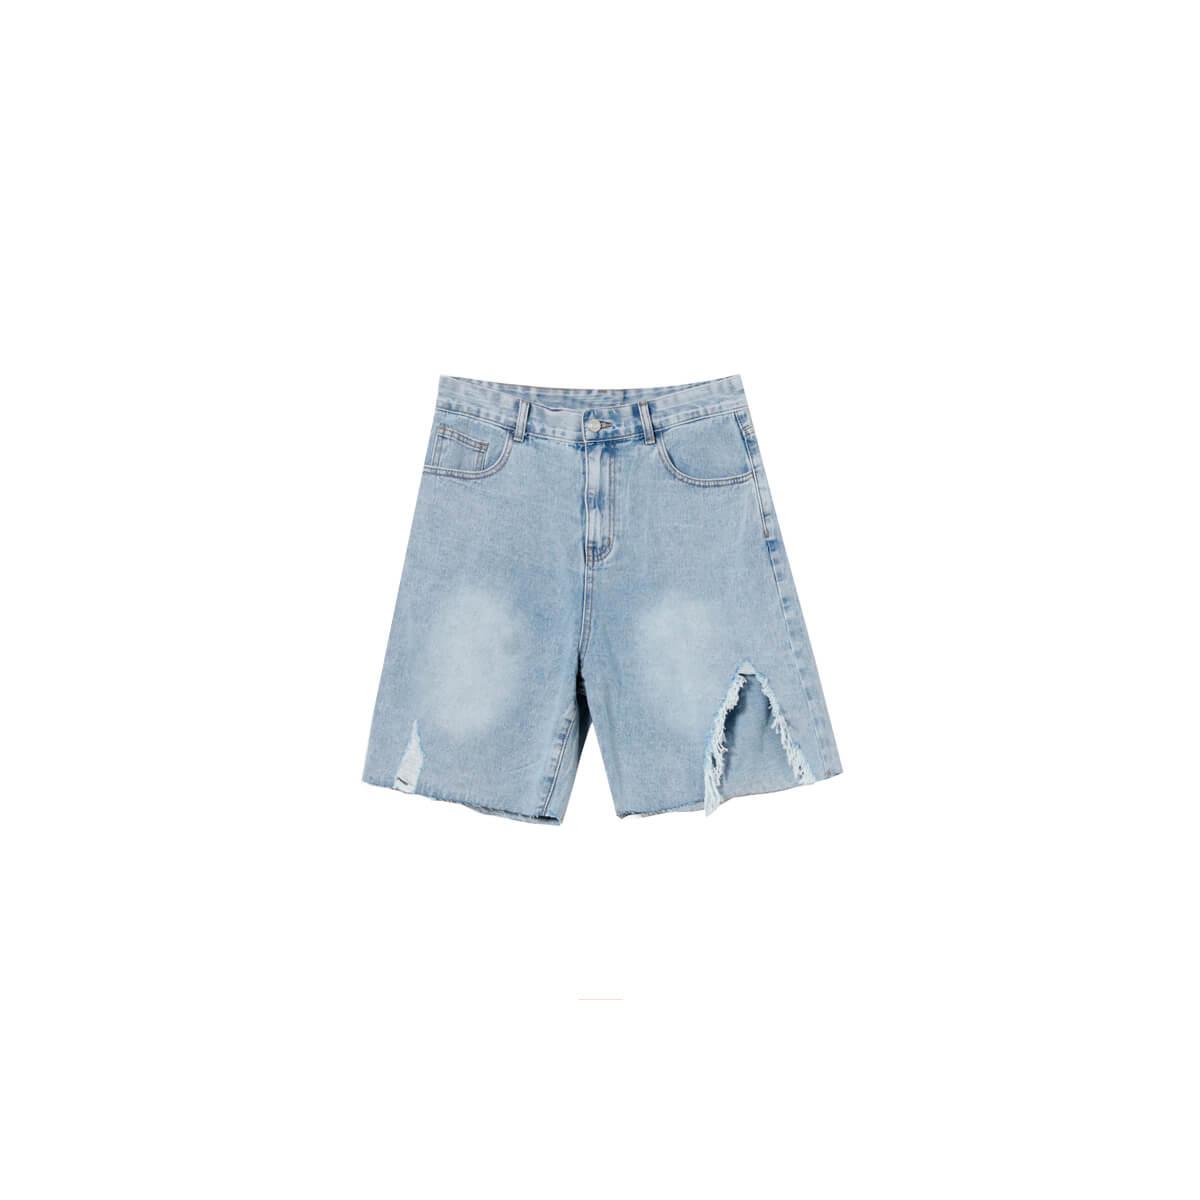 Шорты Cui Layout Studio Ripped Split Denim Shorts Light Blue